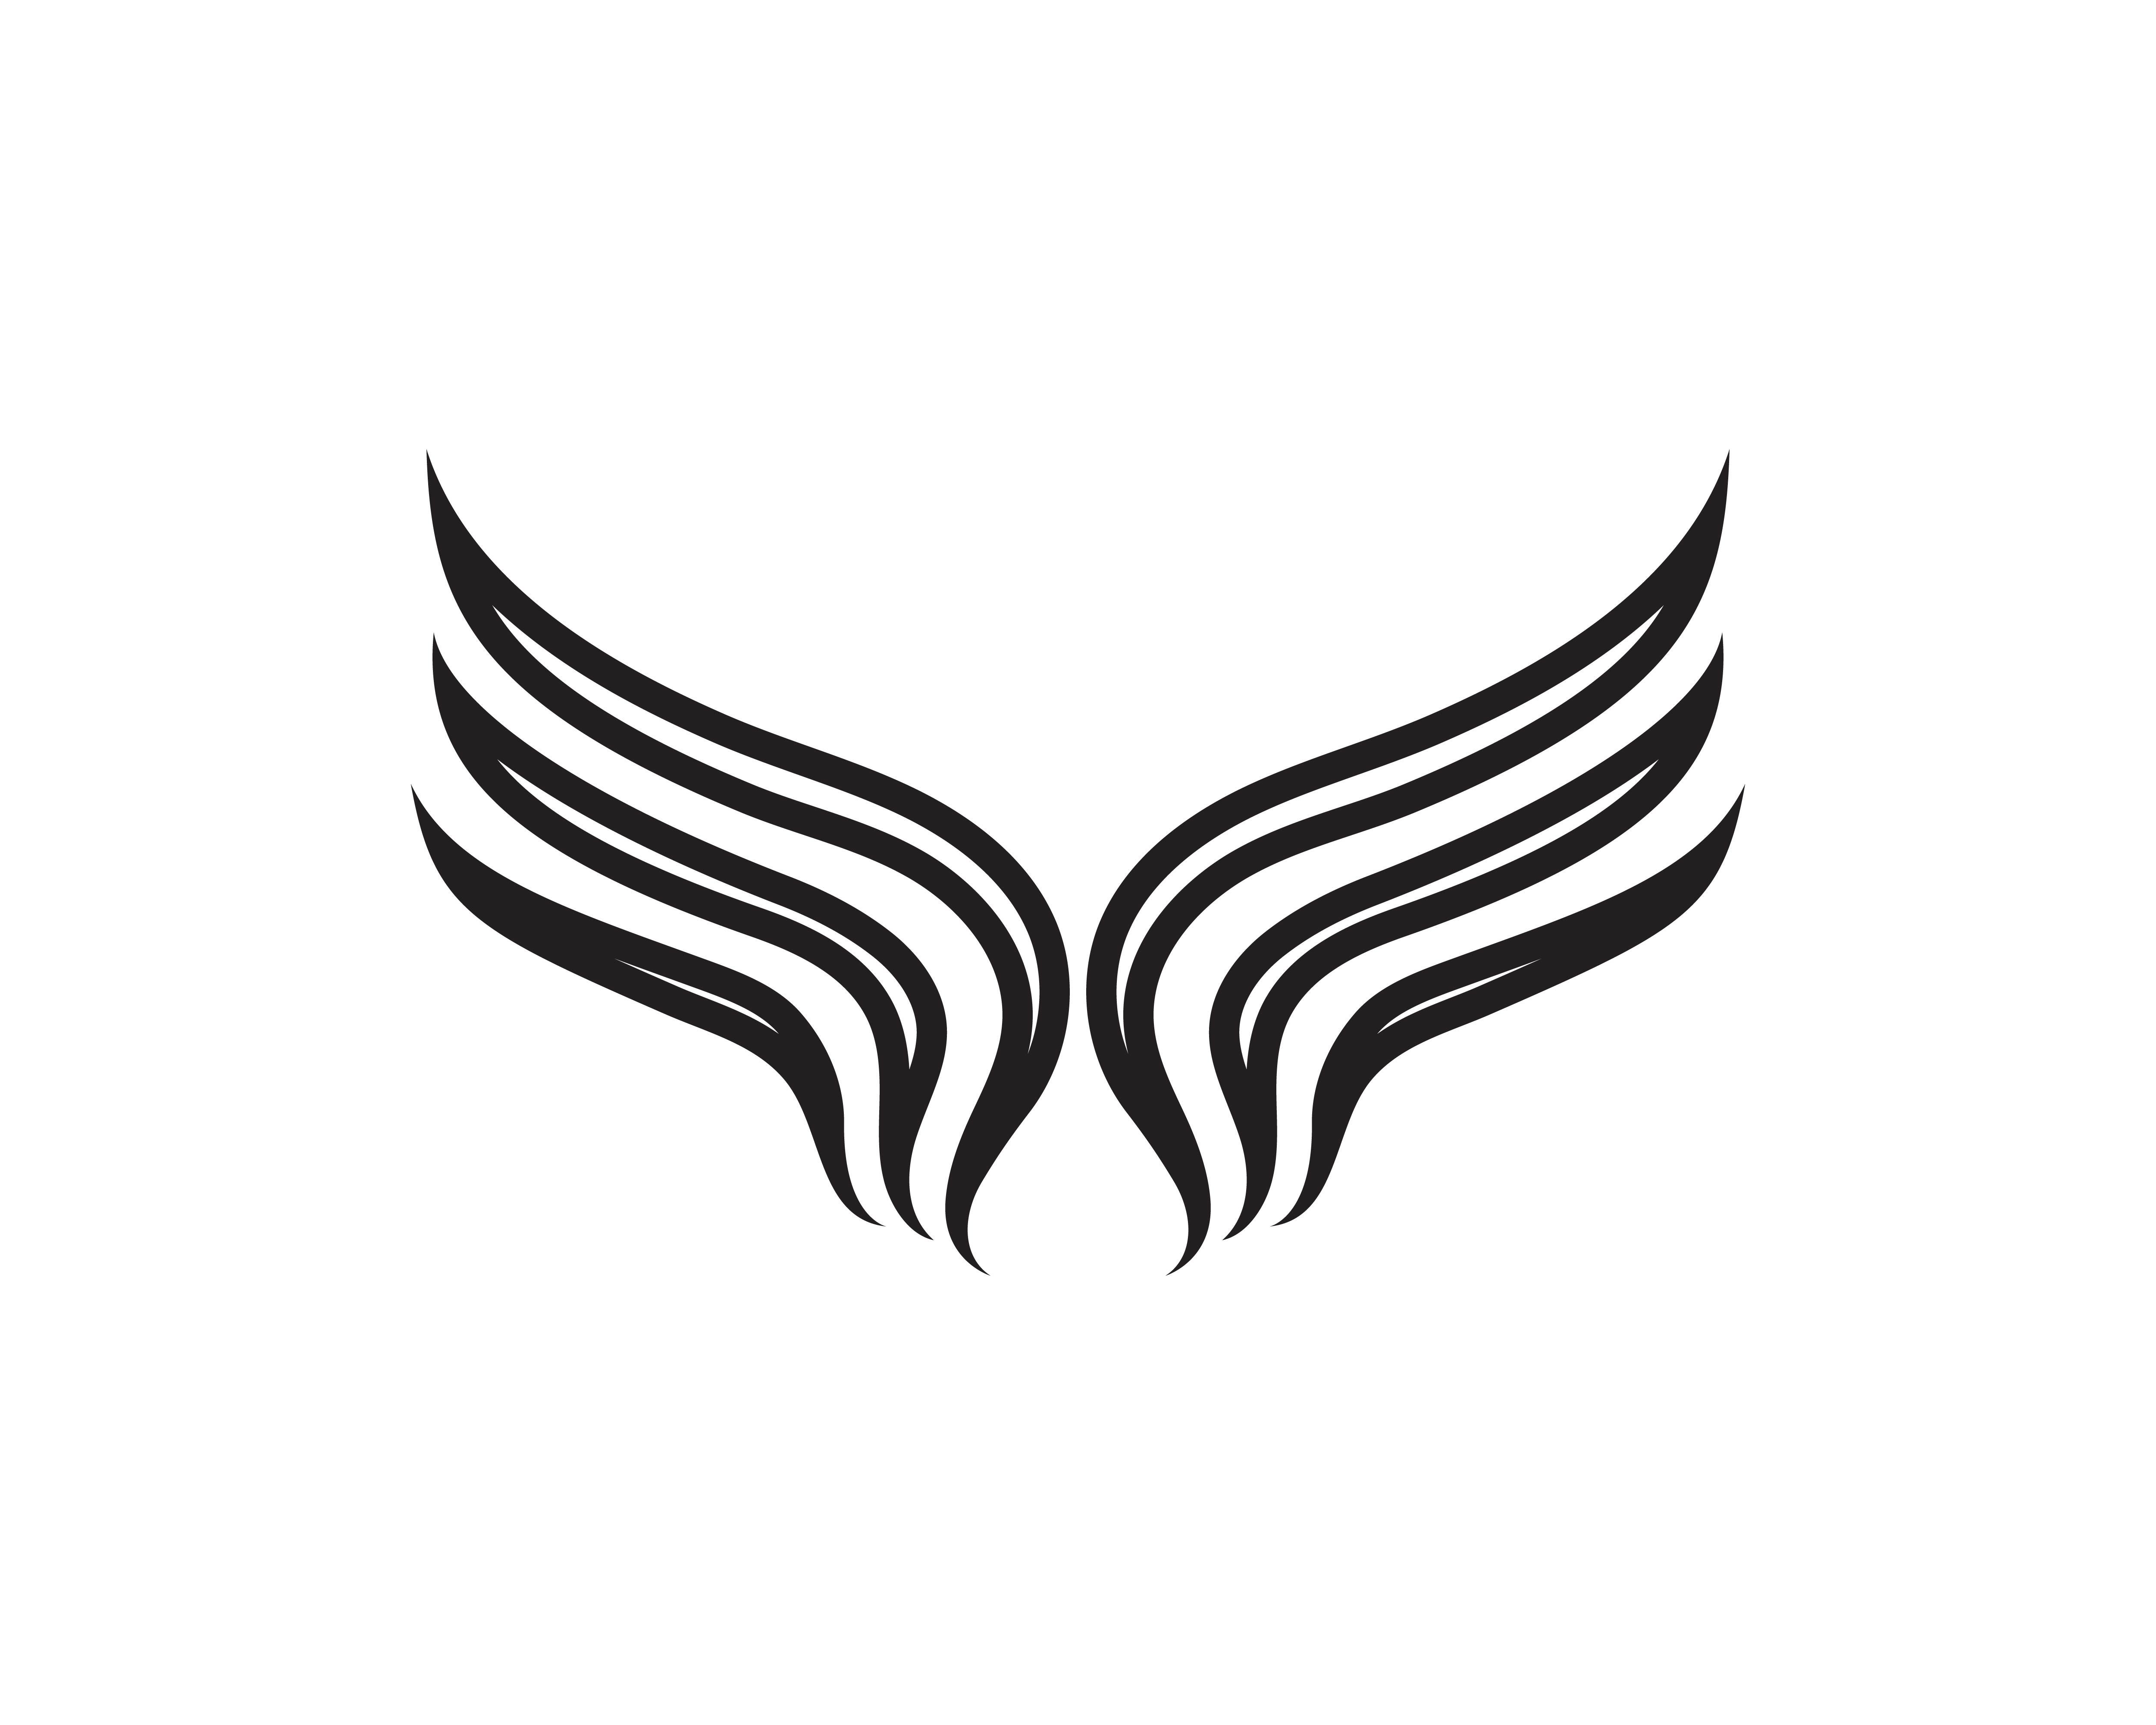 Wing Black Logo Template Vector Illustration Design Vector